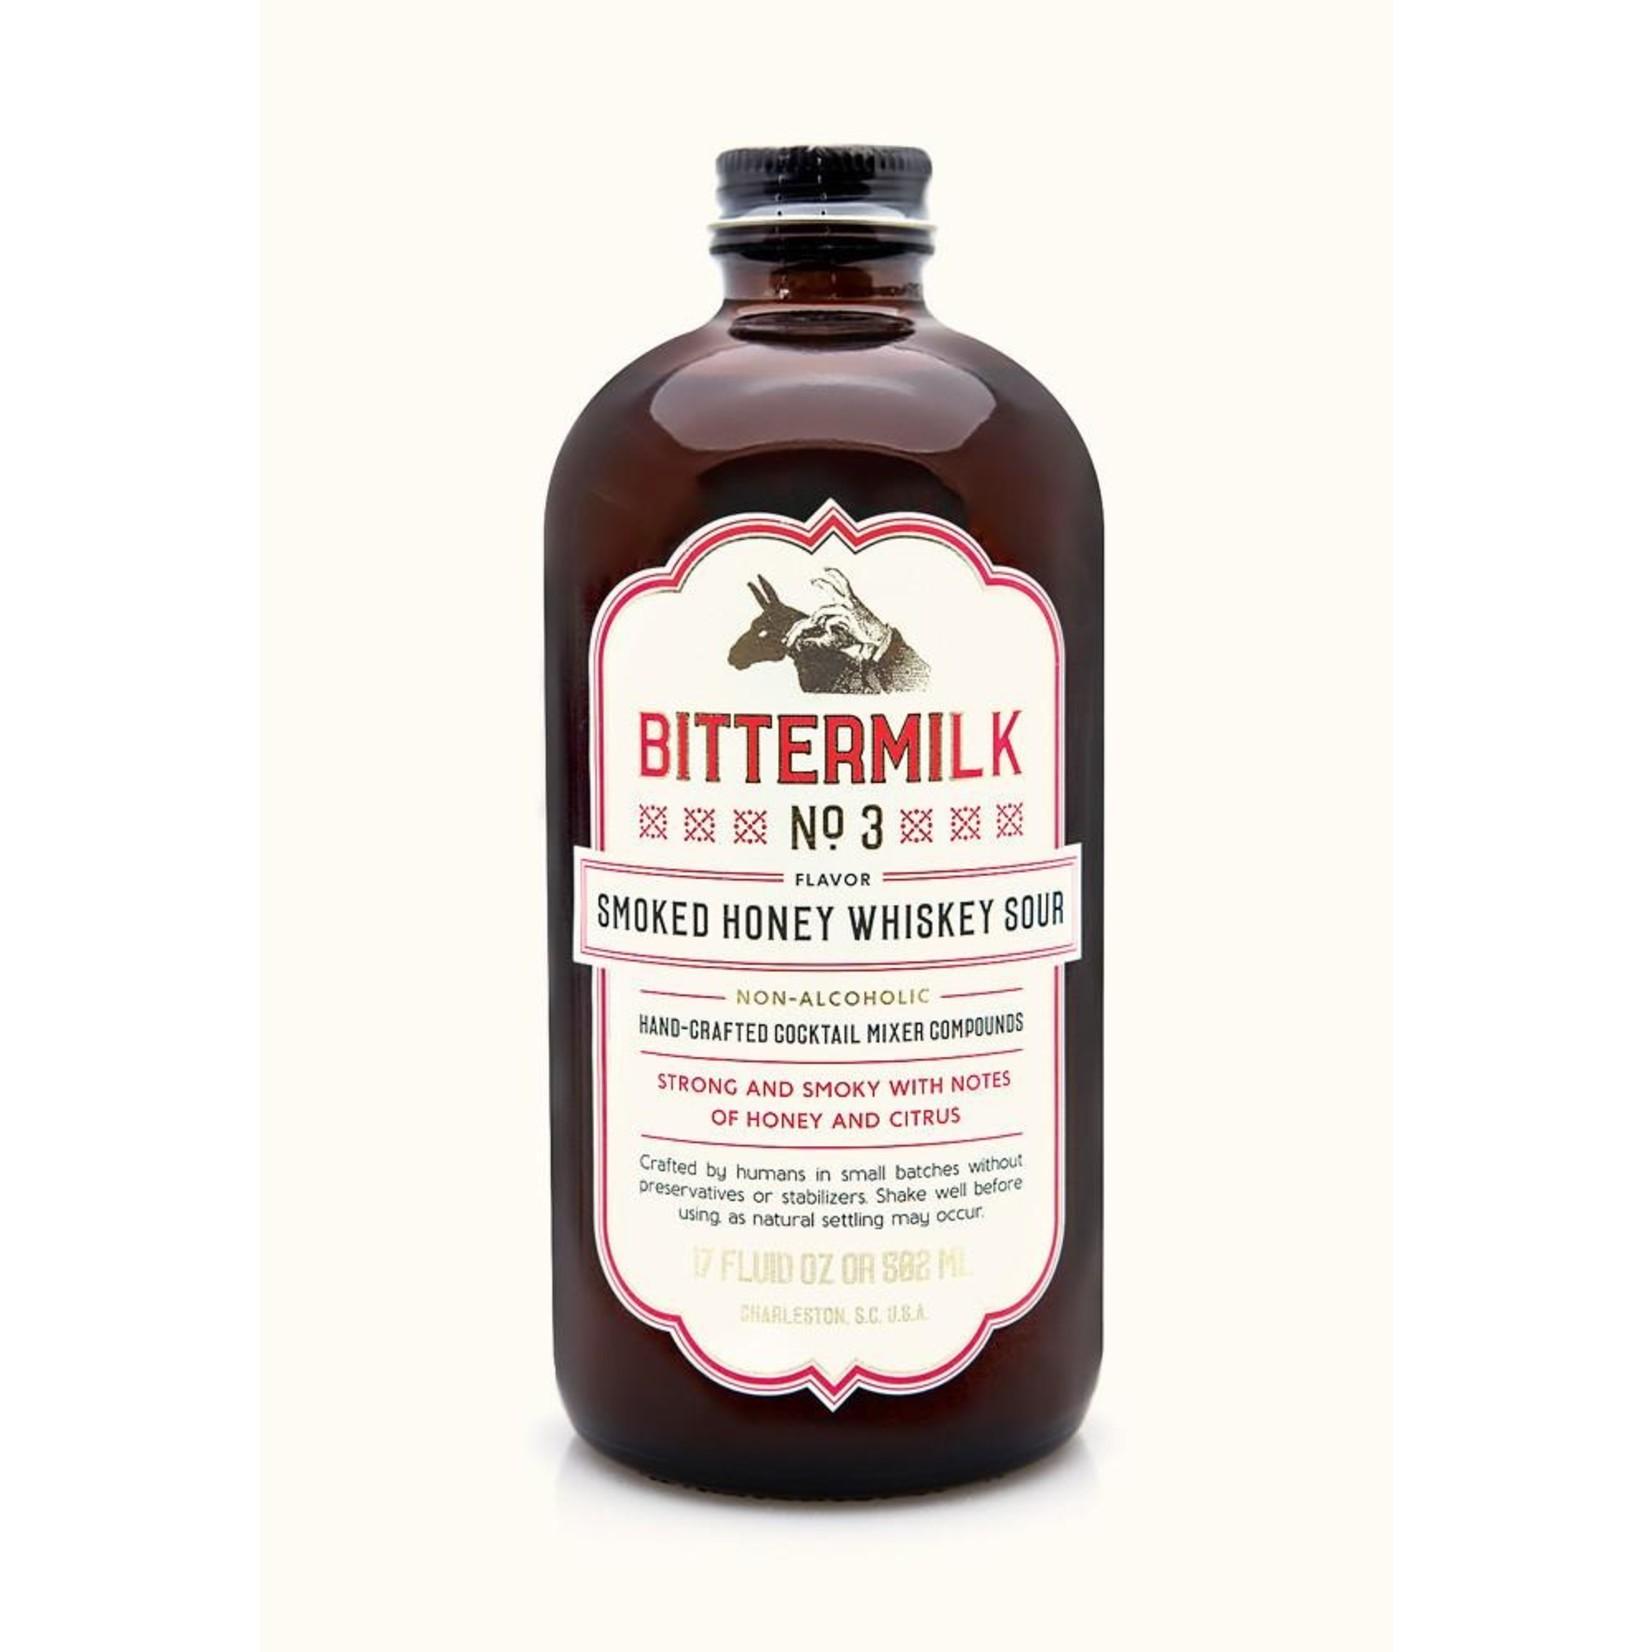 Bittermilk No.3 - Smoked Honey Whiskey Sour